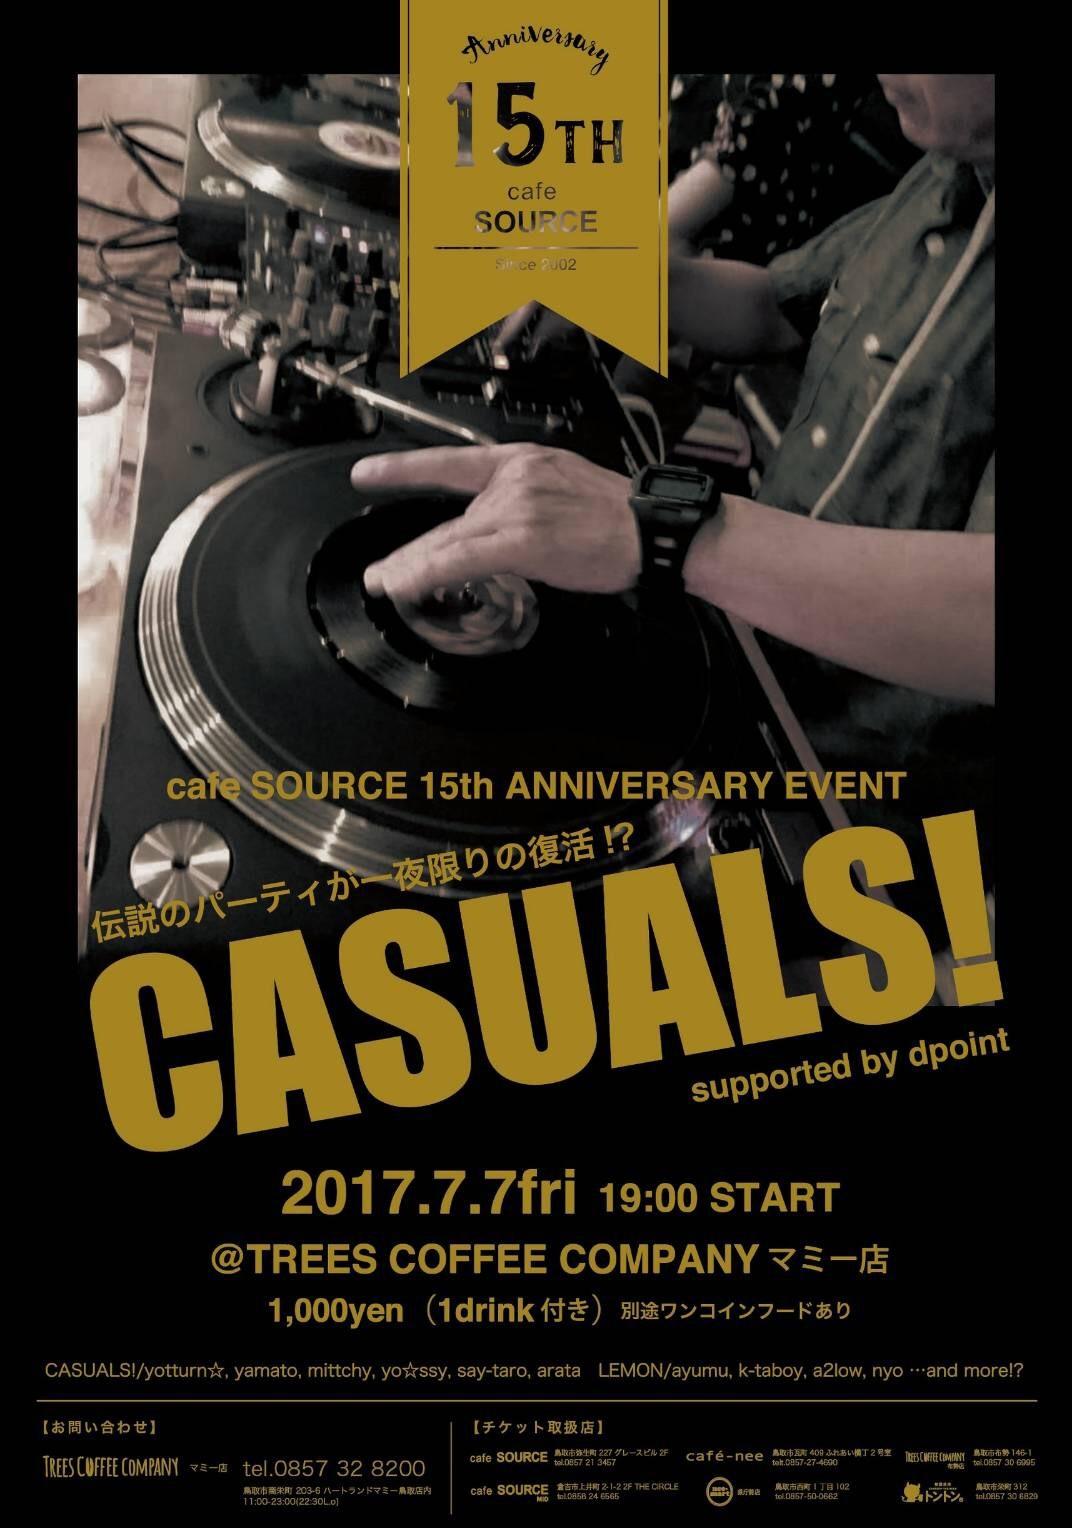 casuals_20170707_1